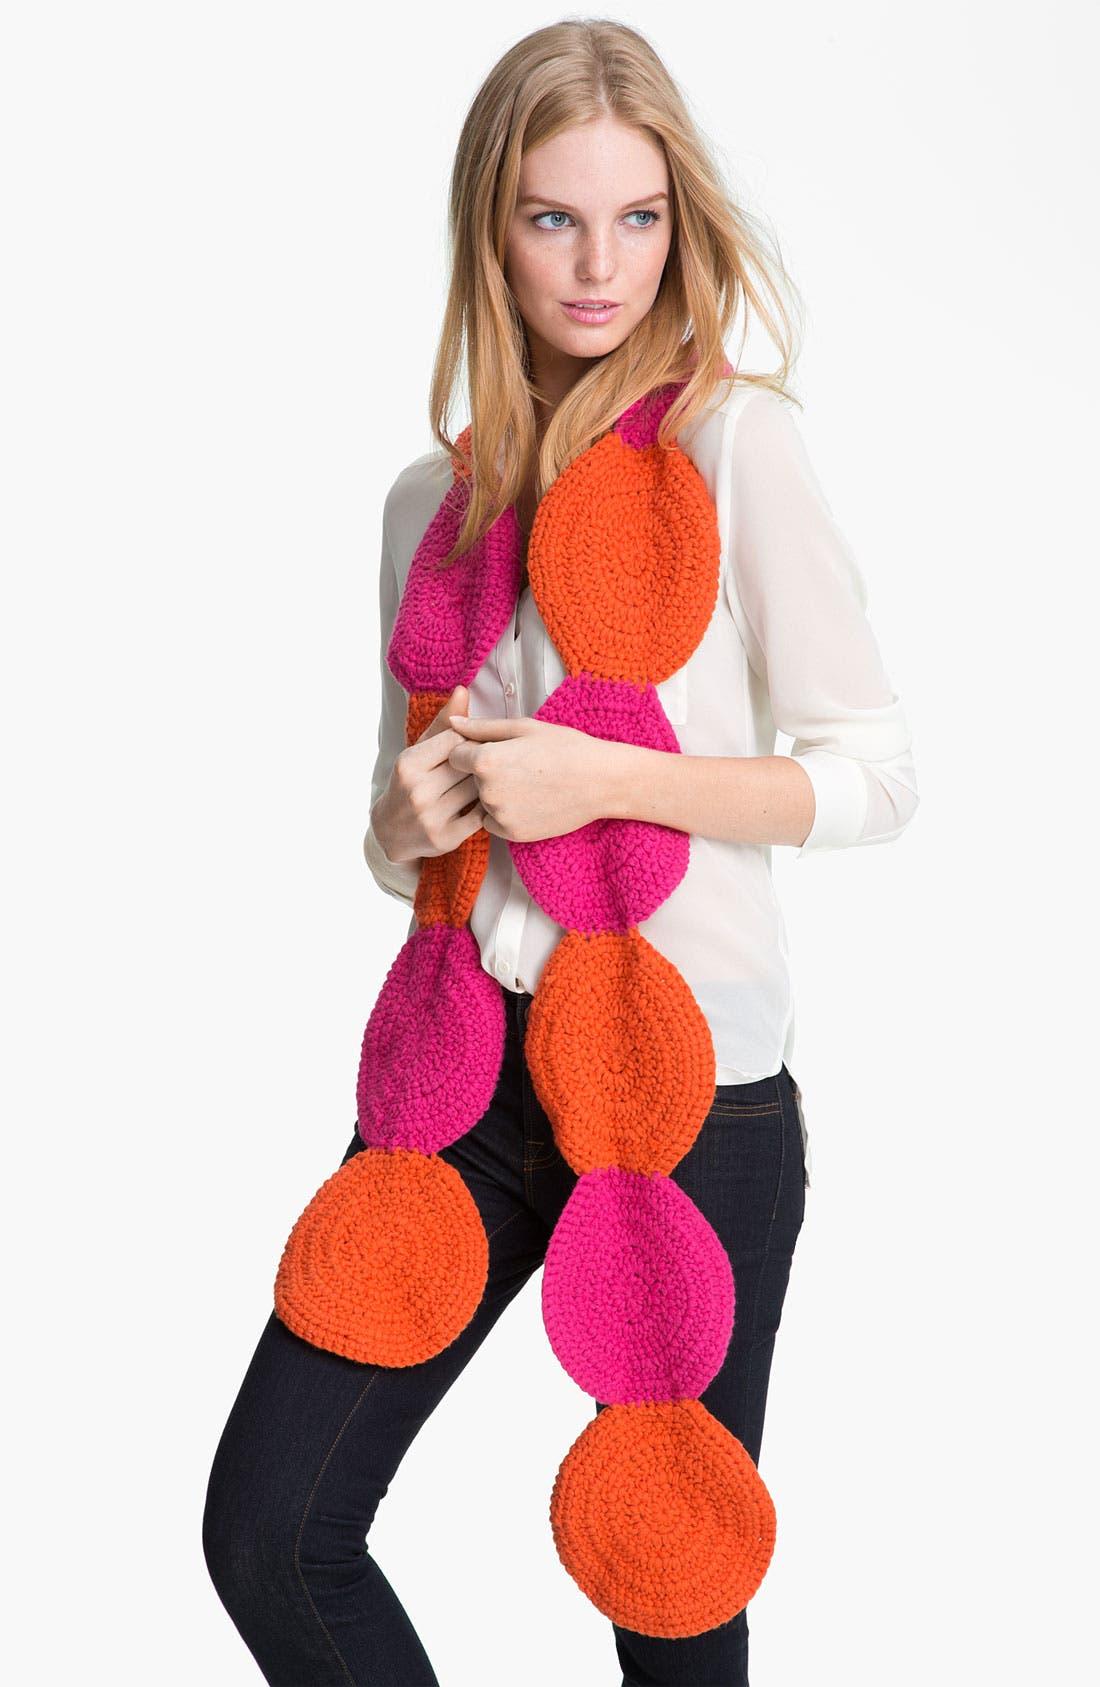 Alternate Image 1 Selected - kate spade new york 'women for women' crochet circle scarf